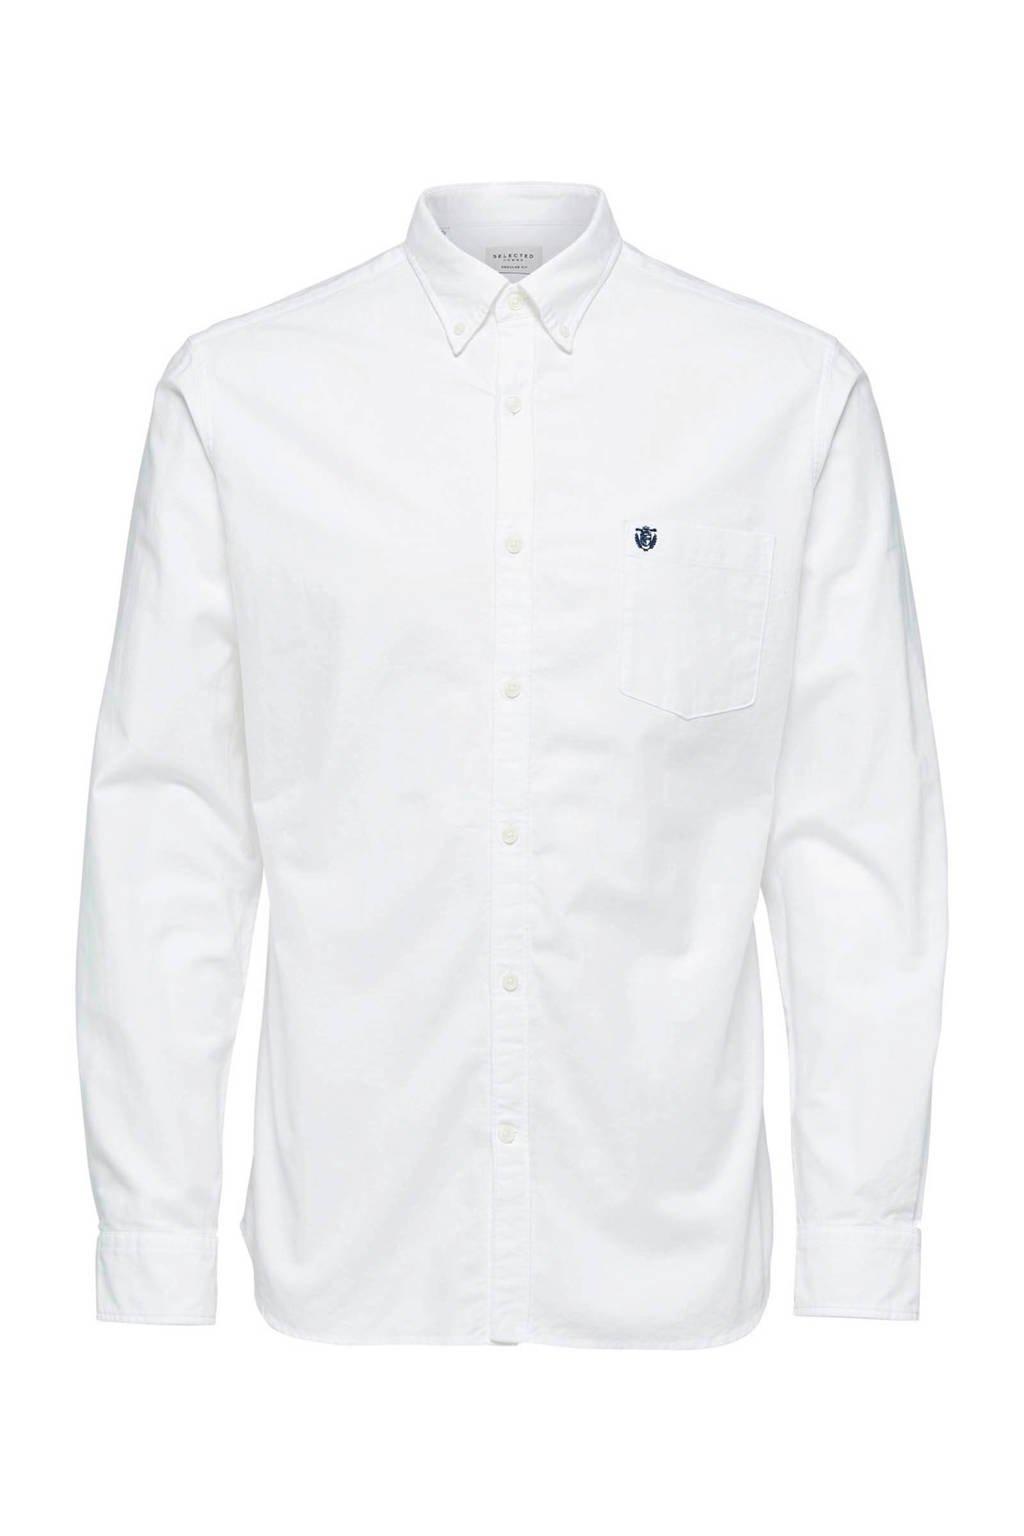 Selected Homme +Fit regular fit overhemd wit, Wit